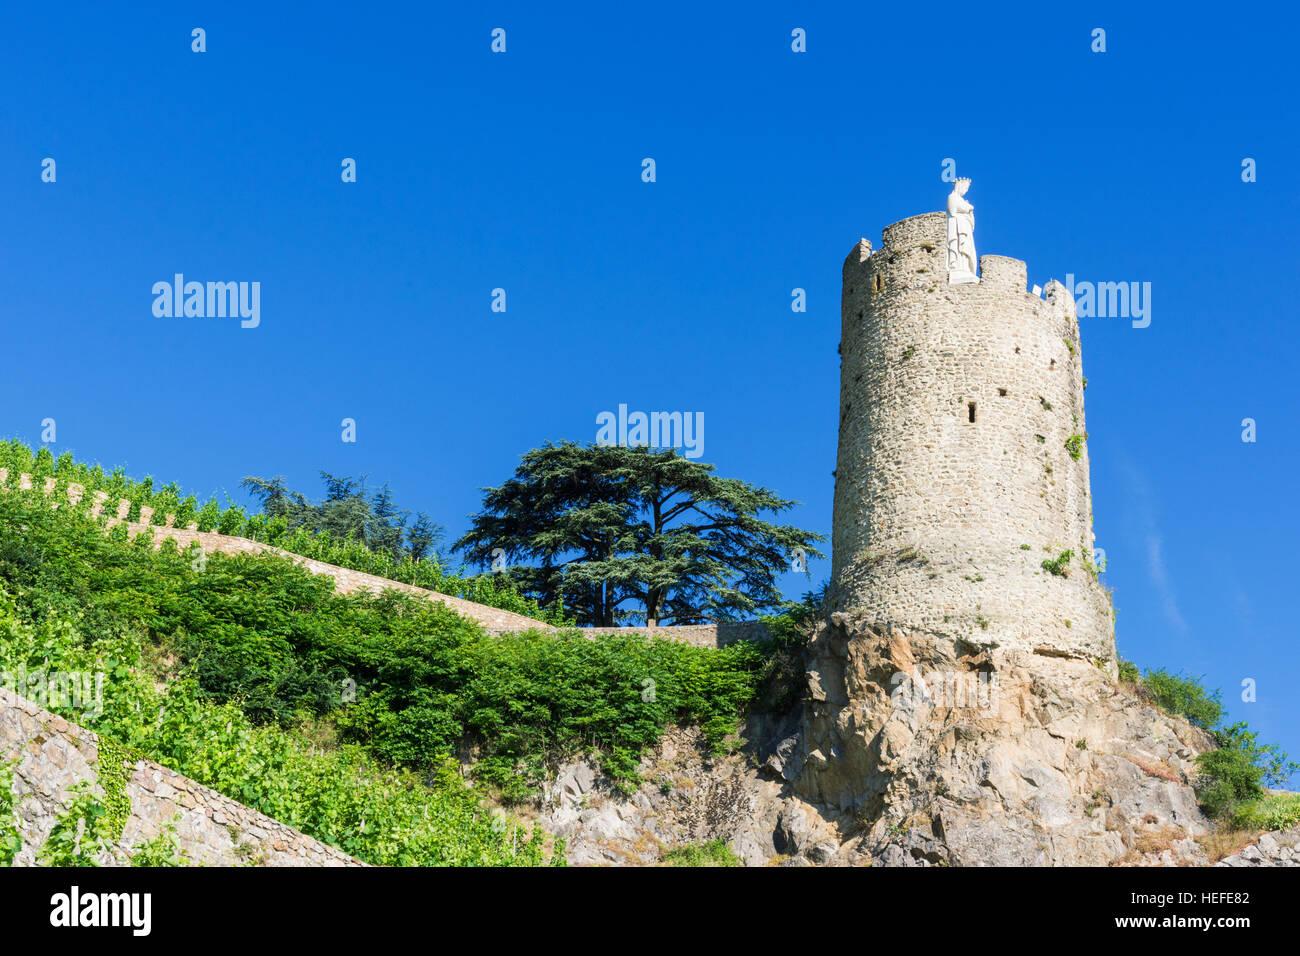 The 16th century watchtower Tour de l'Hôpital overlooked by terraced vineyards above Tournon-sur-Rhône, - Stock Image